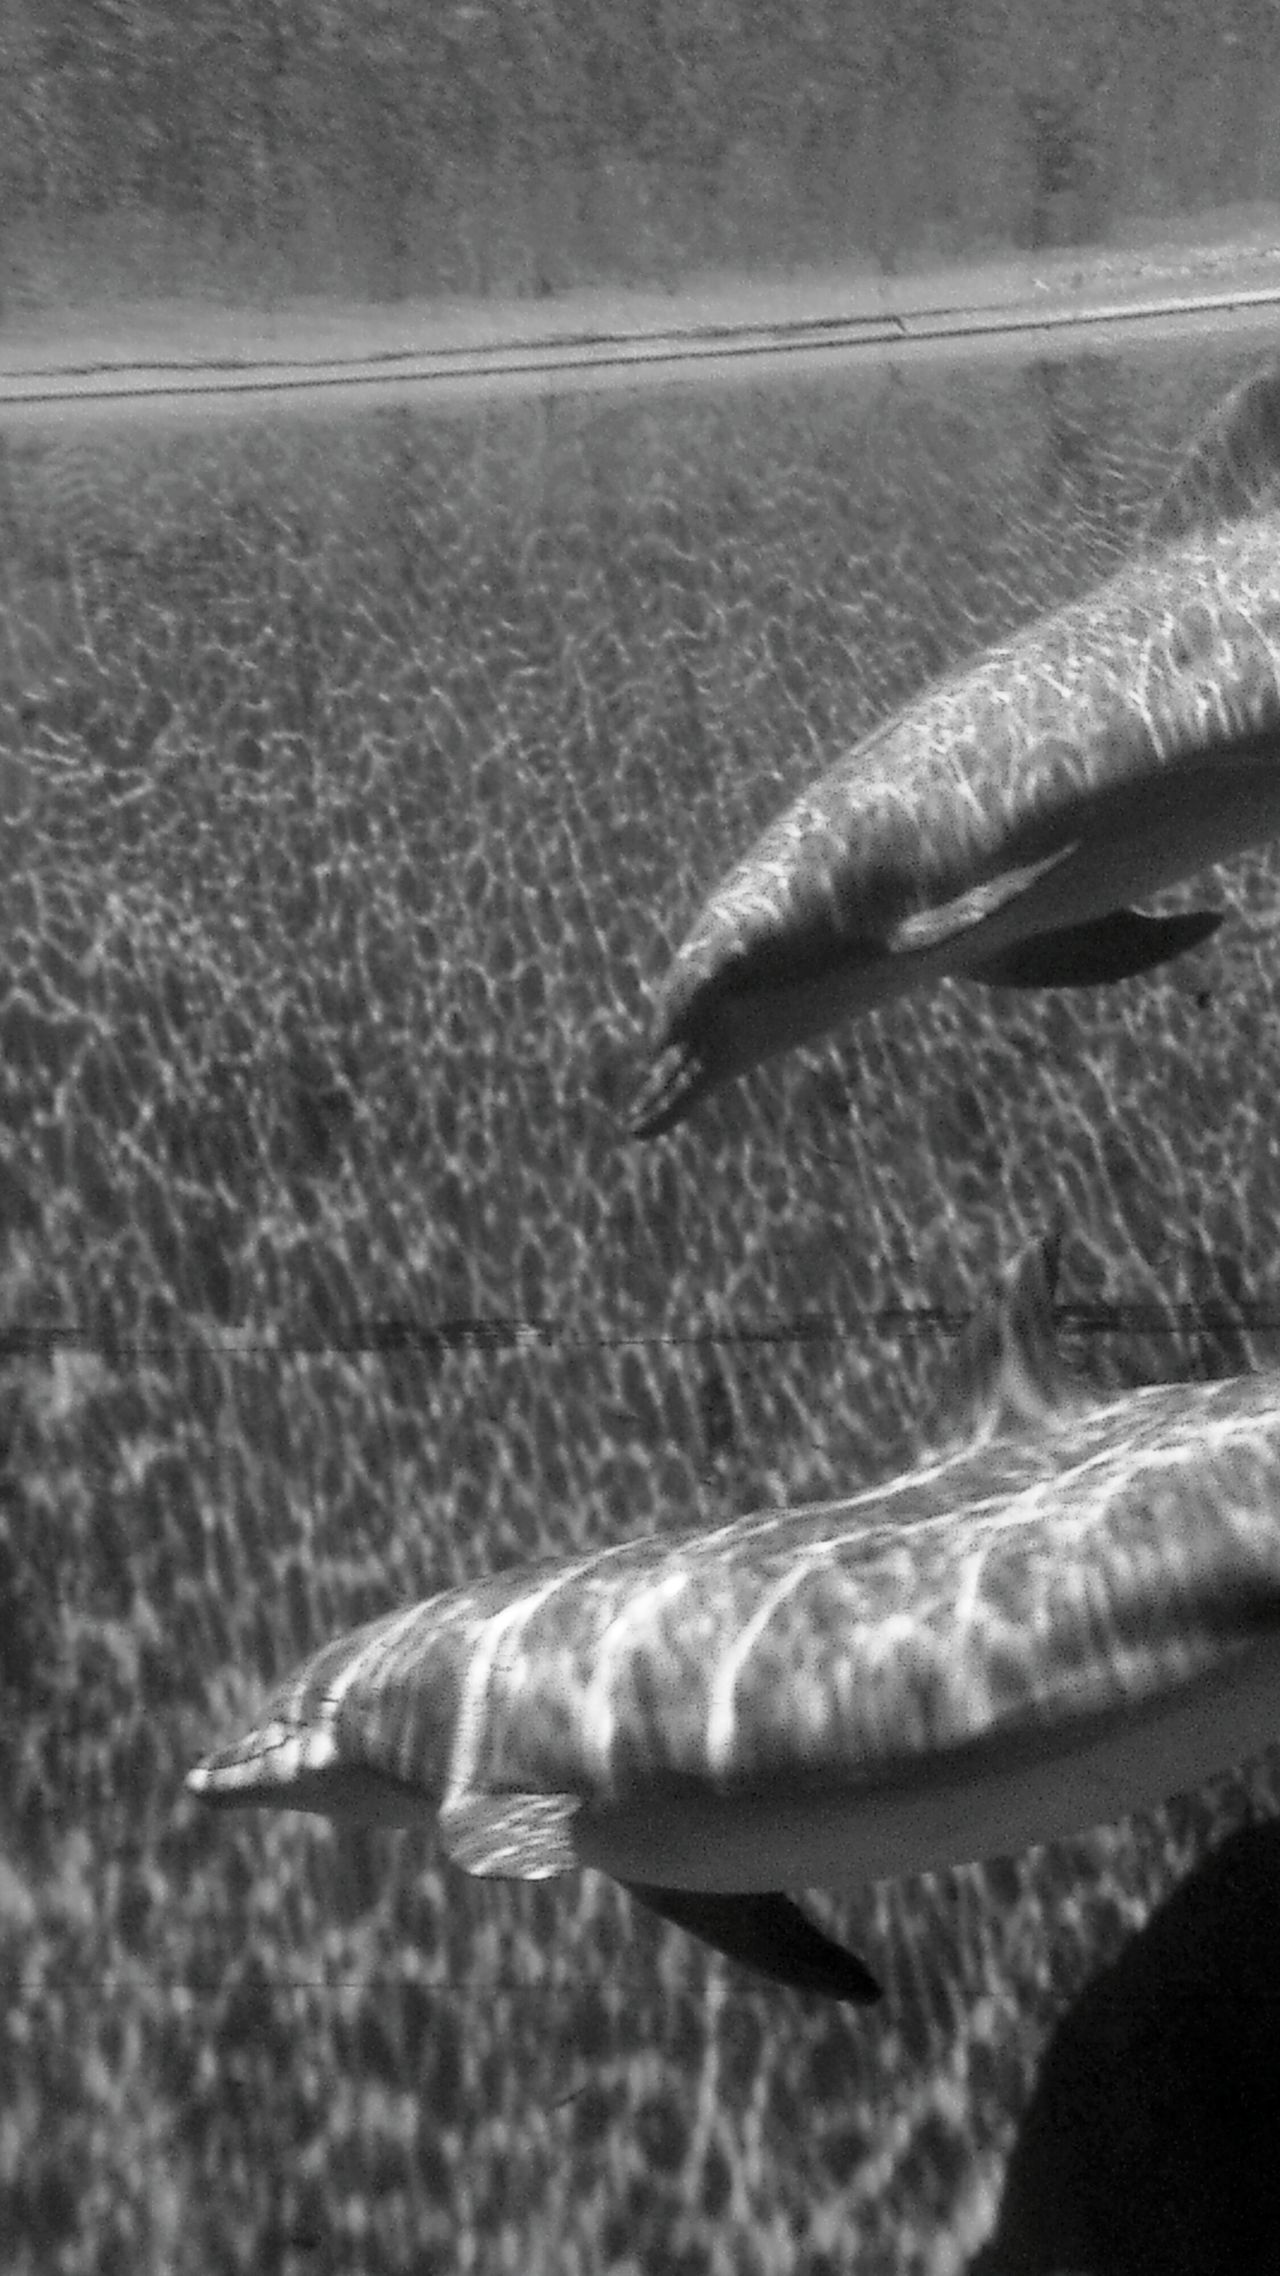 Shades Of Grey Summer Views Dolphines Precious Moments Of Life Genova Aquarium Serenity EyeEm Animal Lover EyeEm Gallery Eyeem Photography